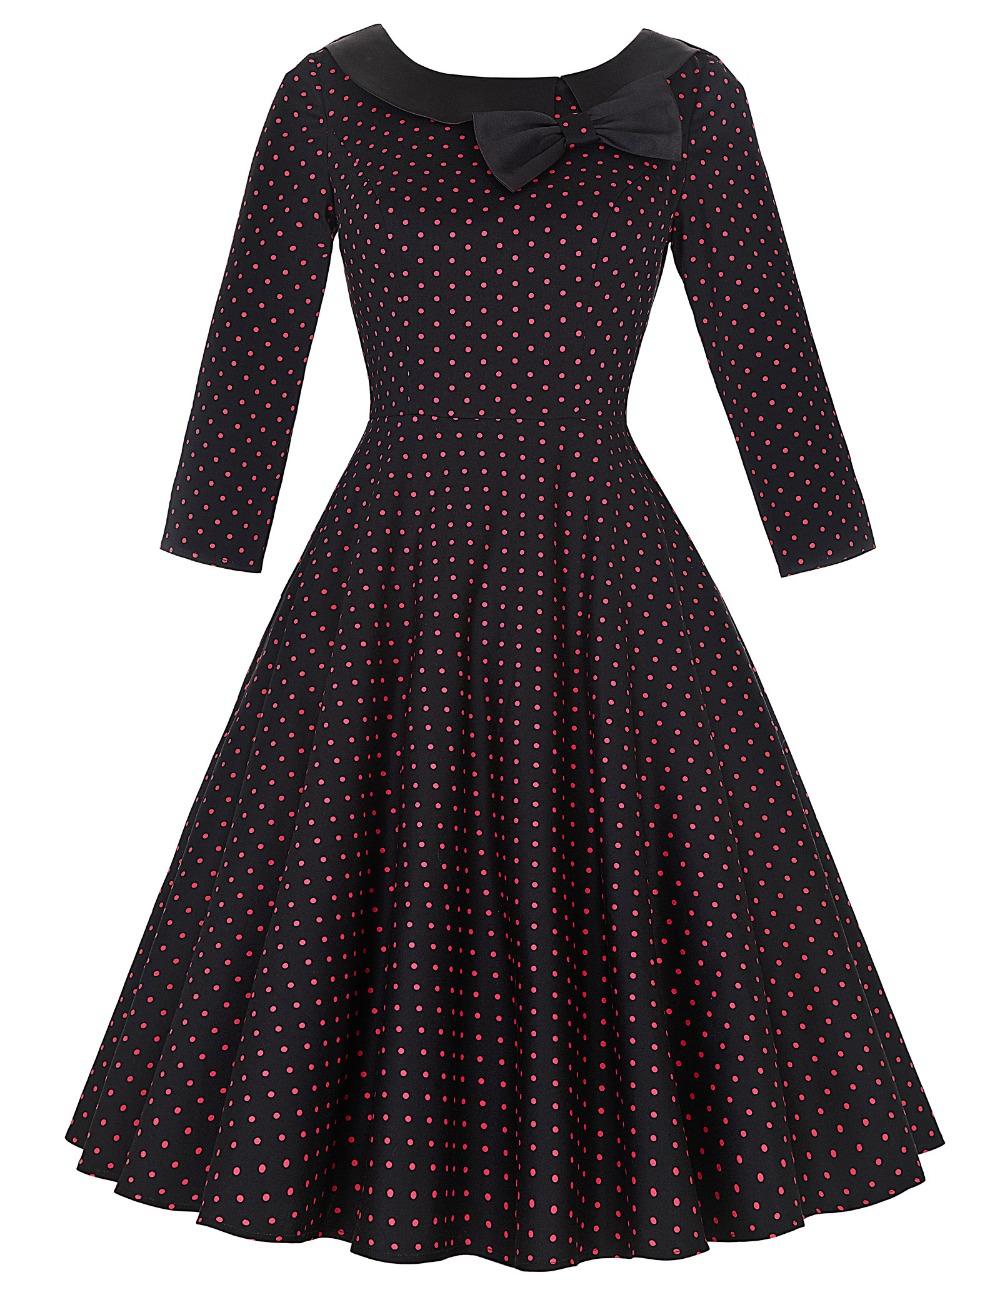 2016 Tonval Women Retro Polka Dot 50s Vintage Swing Dress vestido Elegant Tunic 2/3 Sleeve Ladies Formal work wear Party Dresses